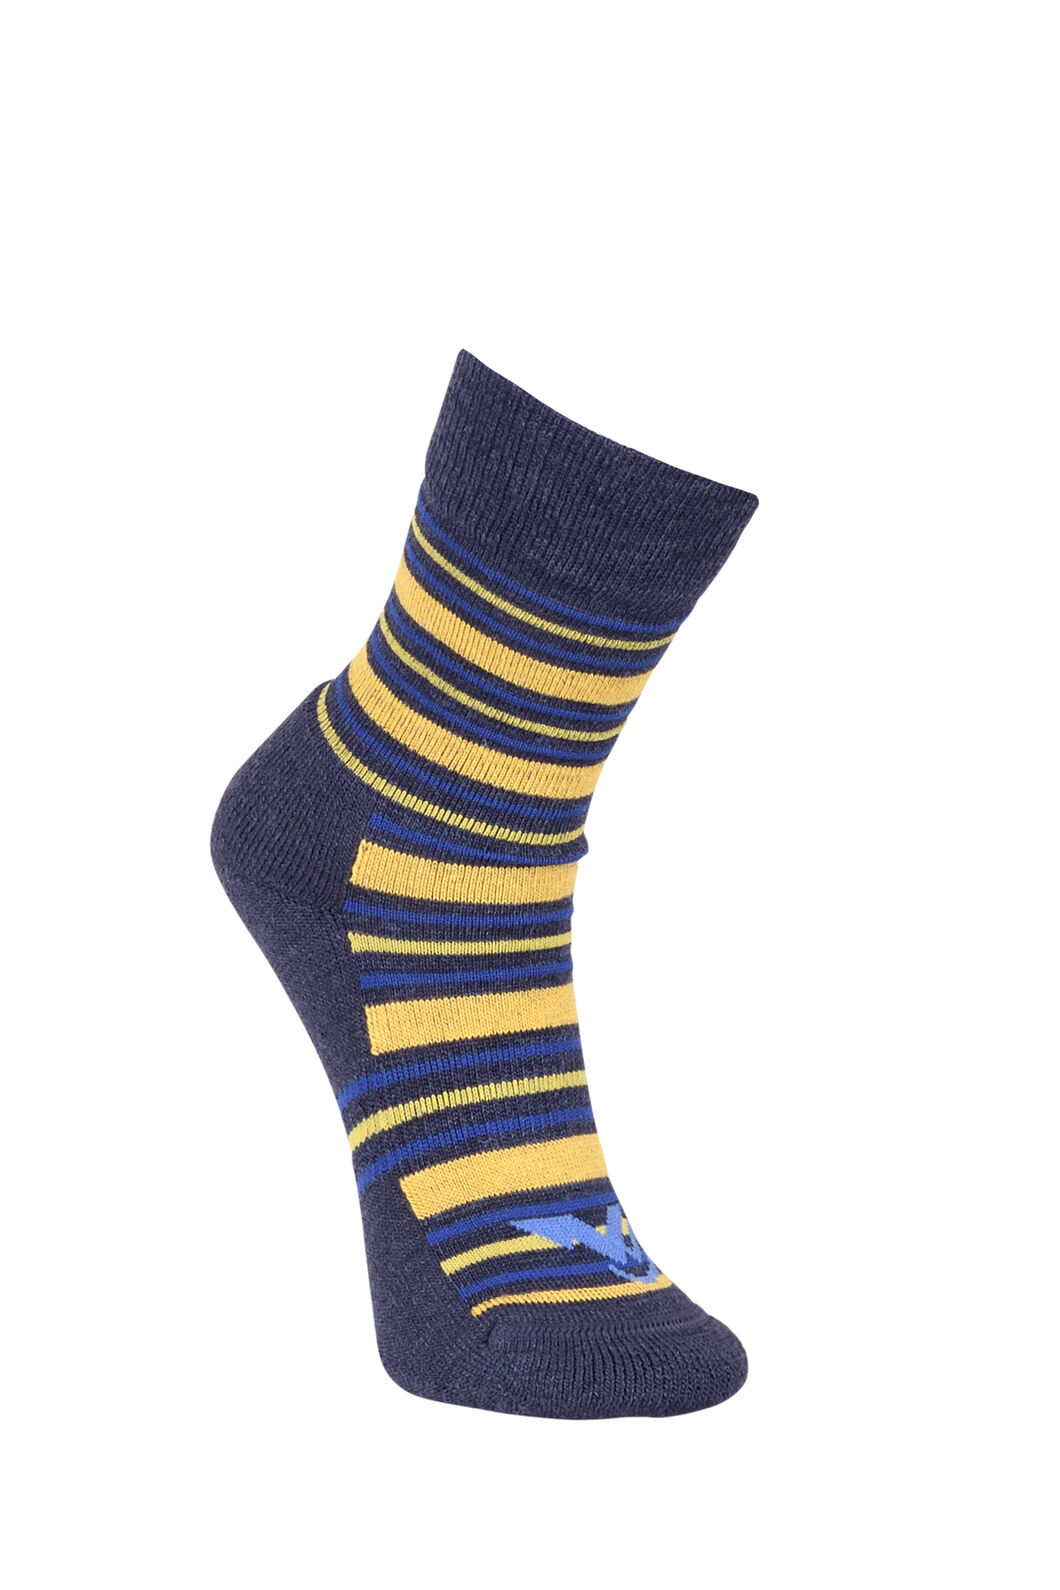 Macpac Footprint Socks Kids', Black Iris/Super Lemon, hi-res